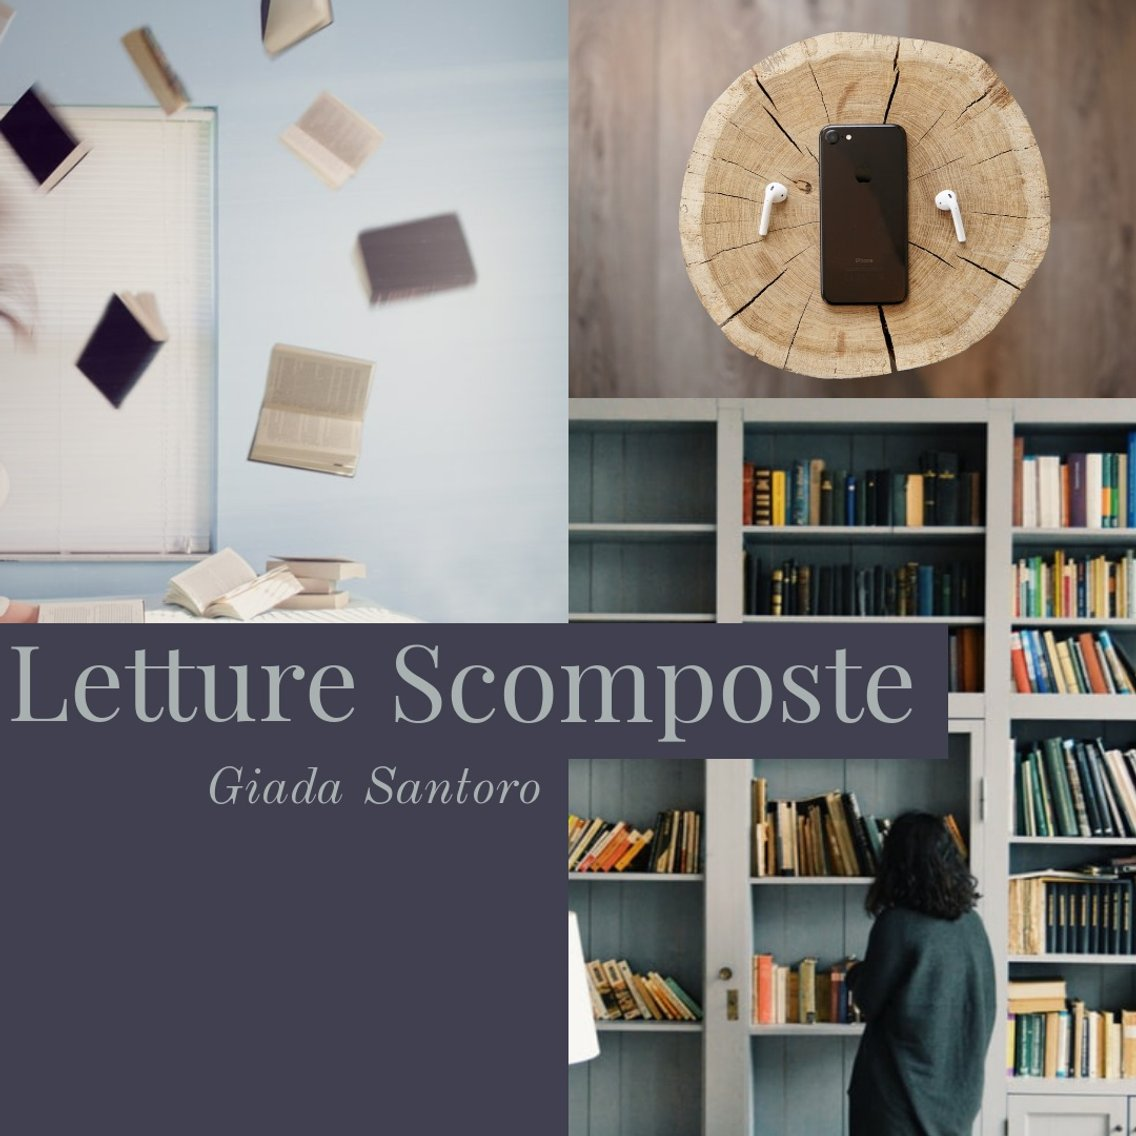 Letture Scomposte - imagen de portada